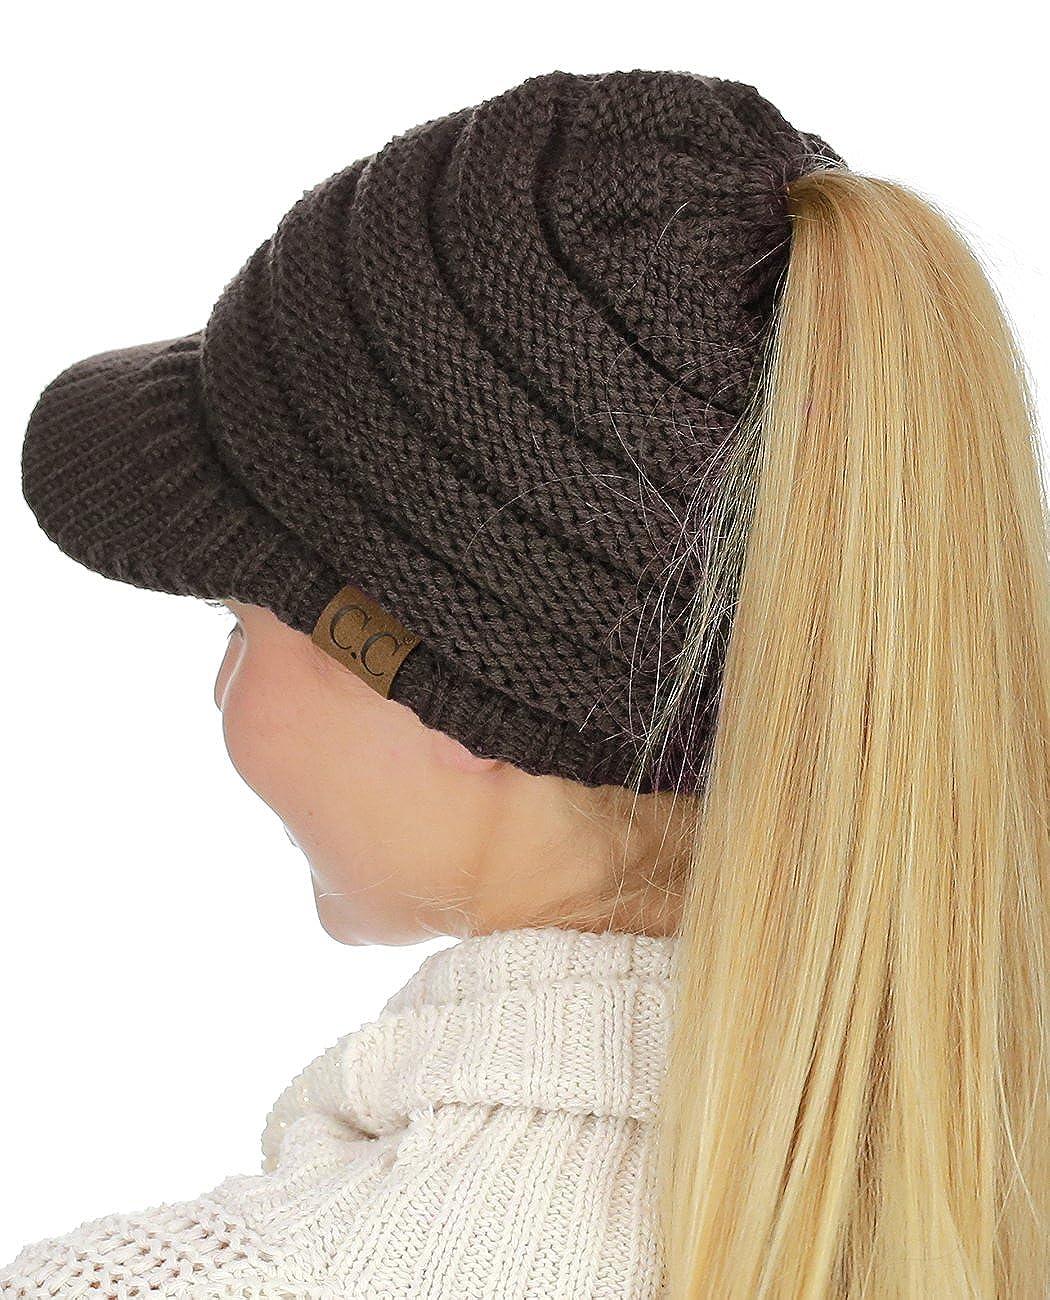 98f244252e4 C.C BeanieTail Warm Knit Messy High Bun Ponytail Visor Beanie Cap Beige  MB131-BG larger image